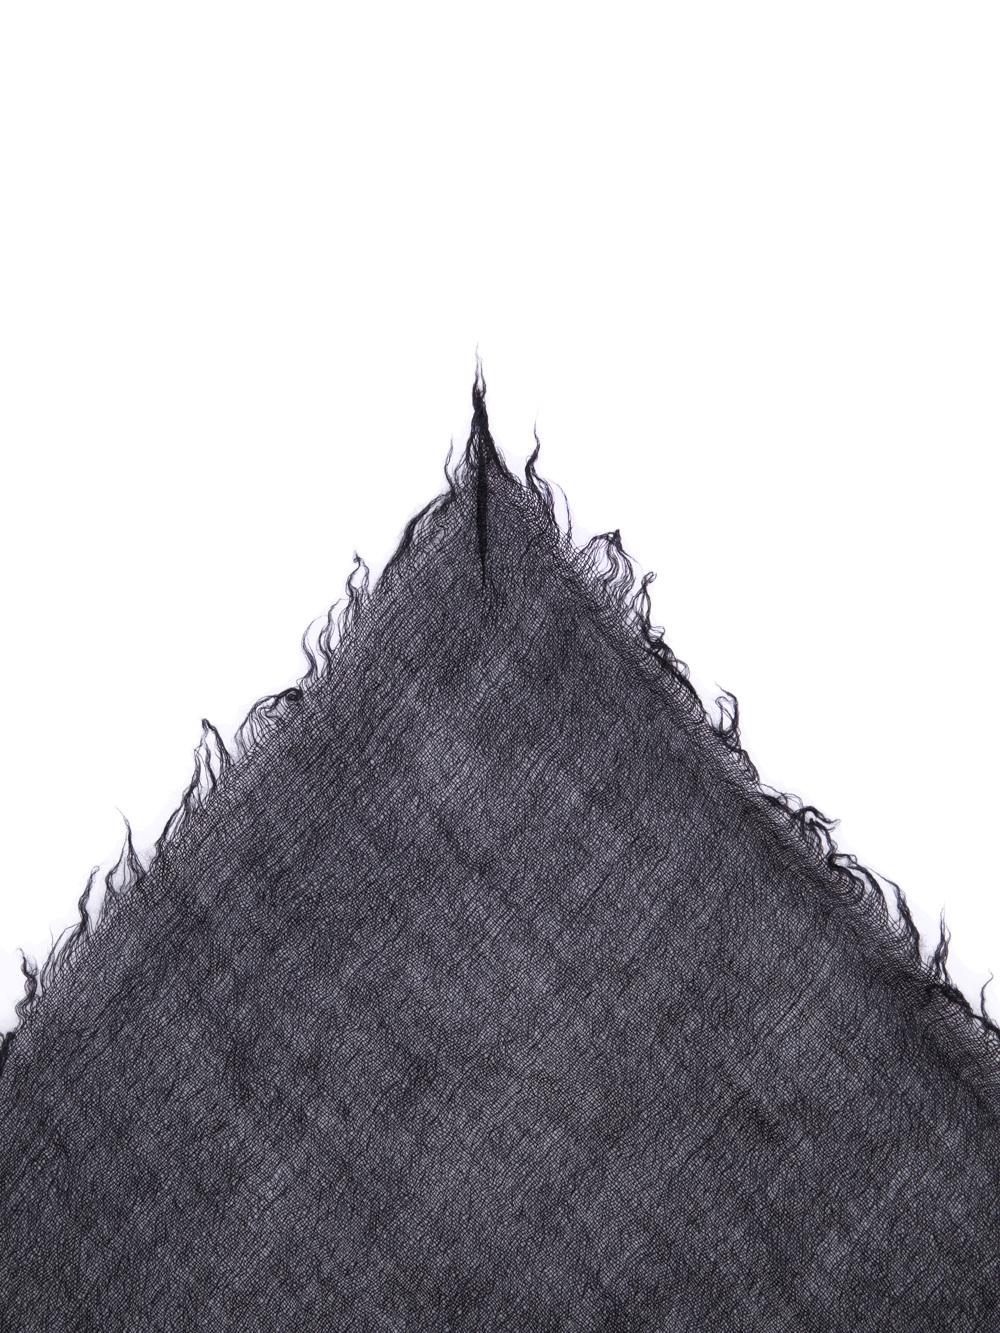 RICK OWENS FW18 SISYPHUS FOLLO SCARF IN BLACK CASHMERE.